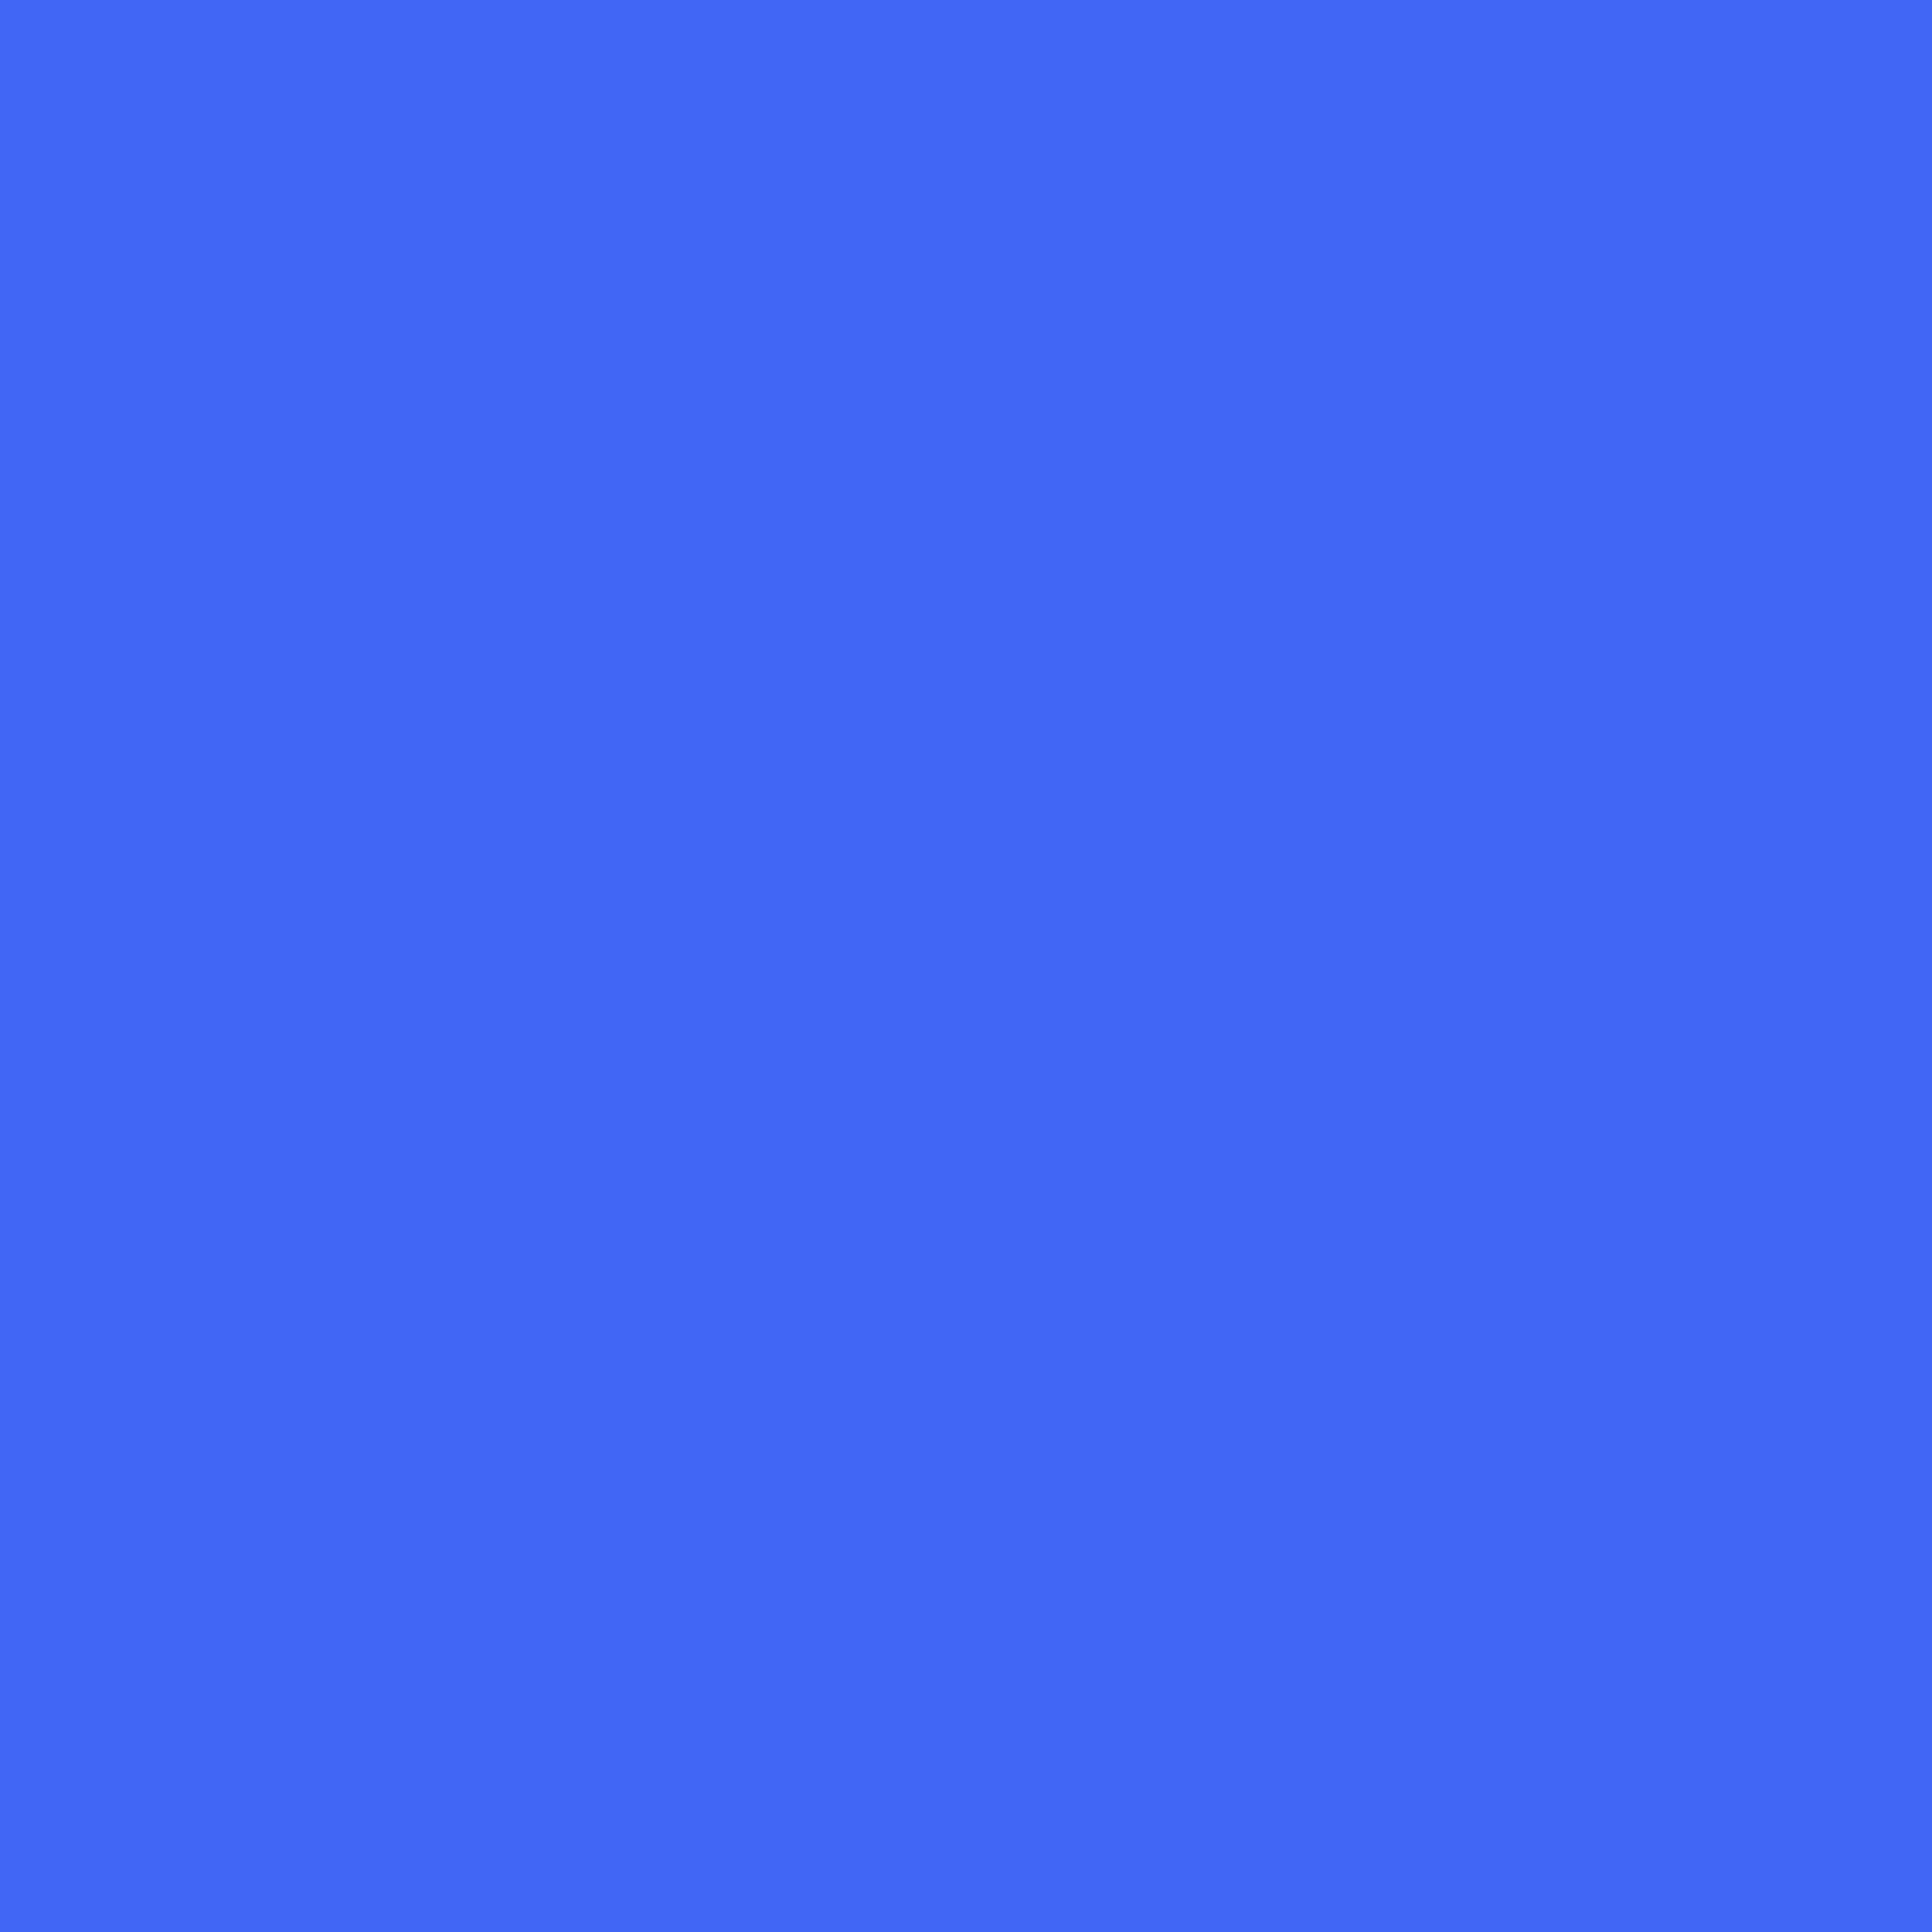 2048x2048 Ultramarine Blue Solid Color Background